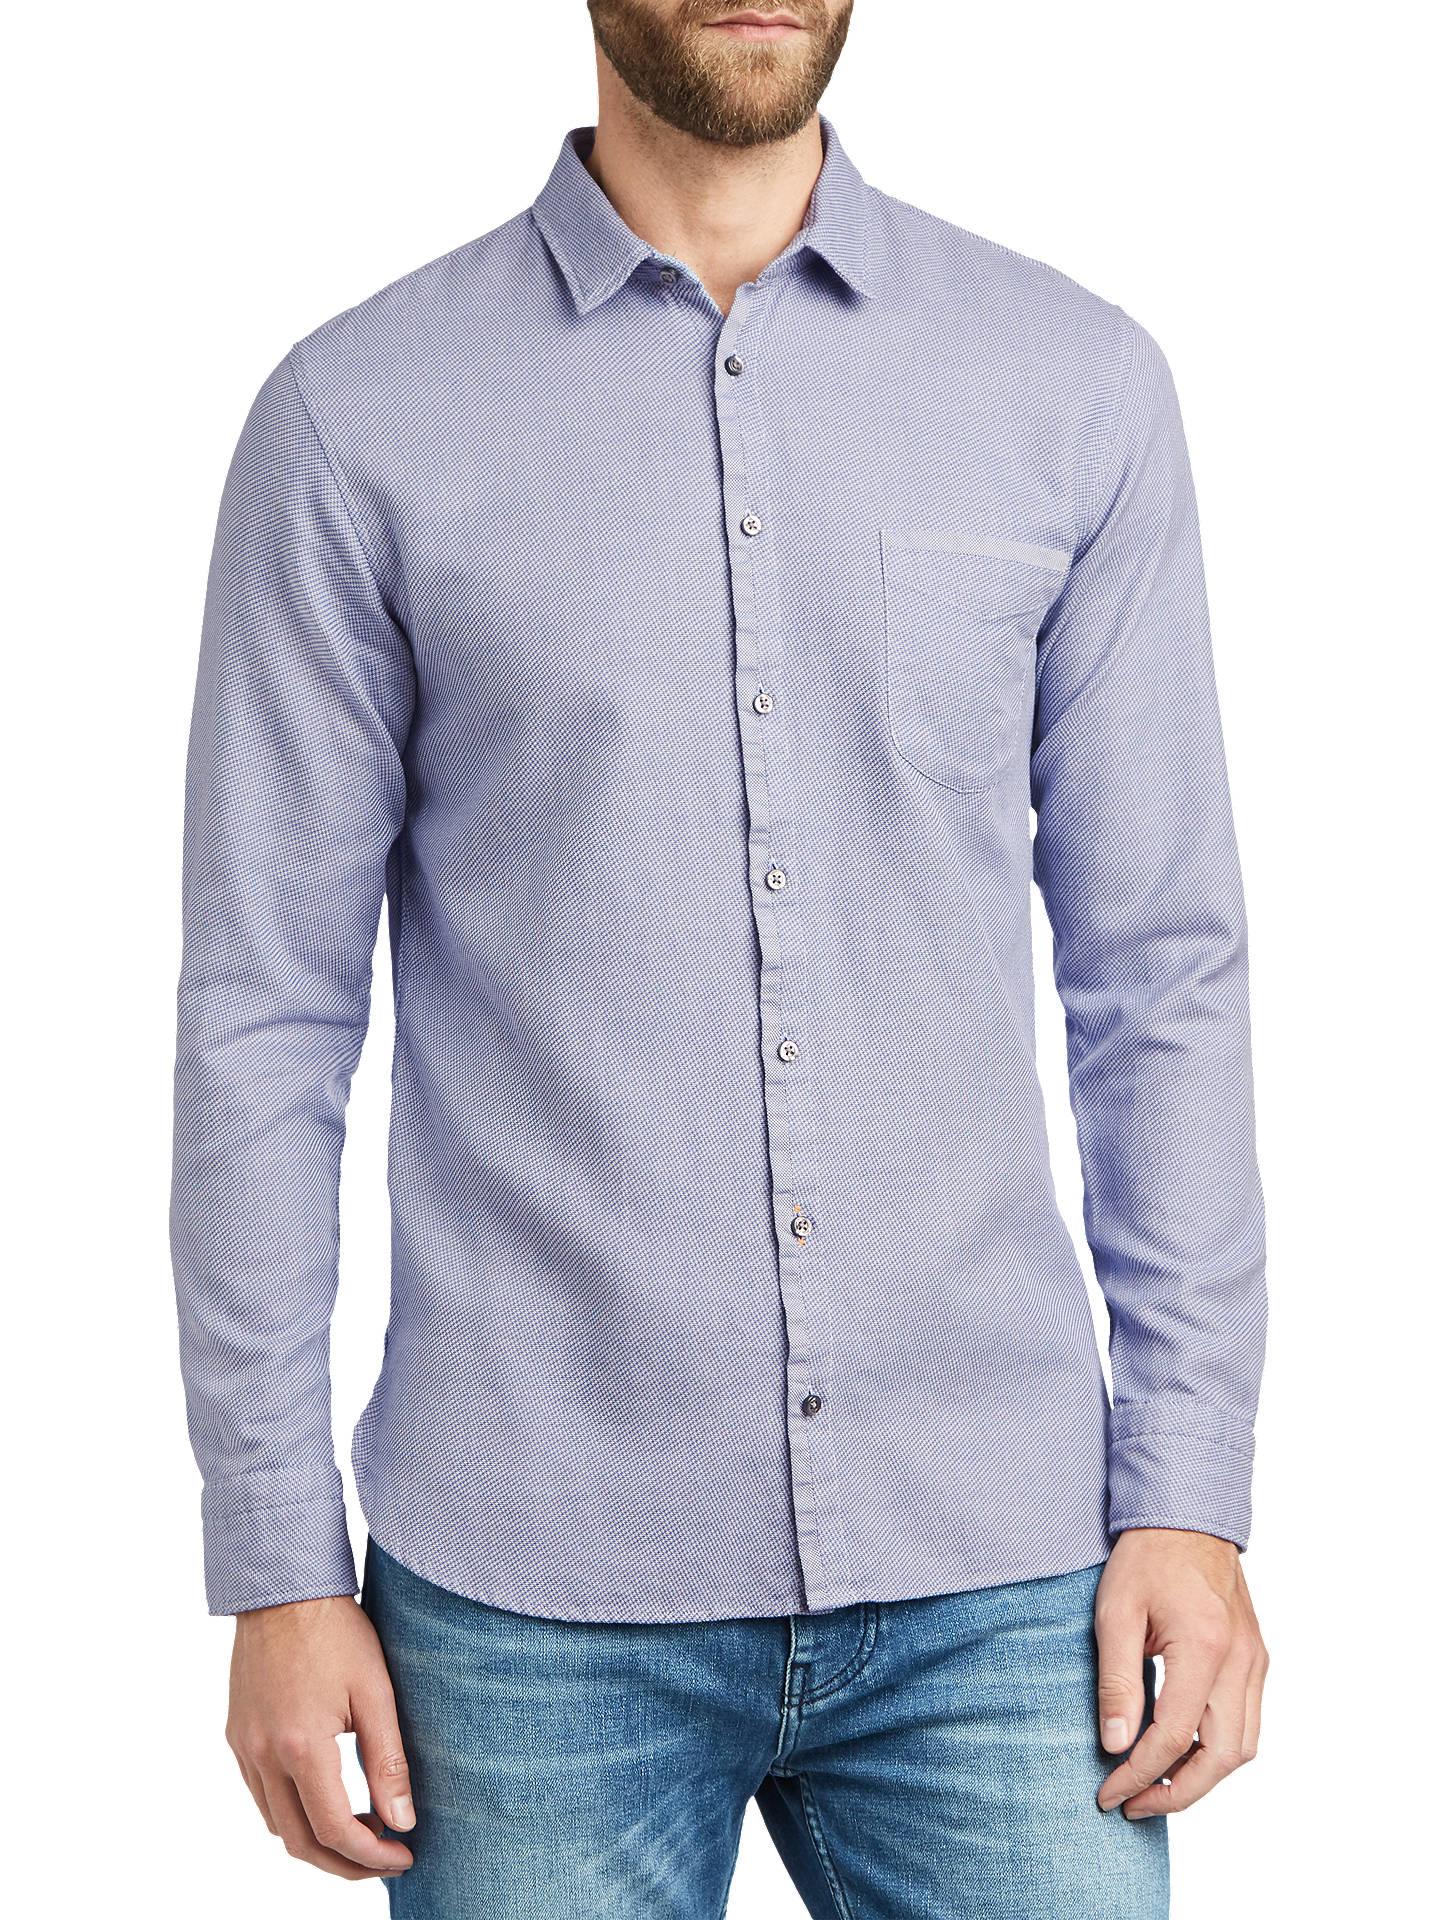 Boss Magneton Long Sleeve Slim Fit Printed Shirt Open Blue At John